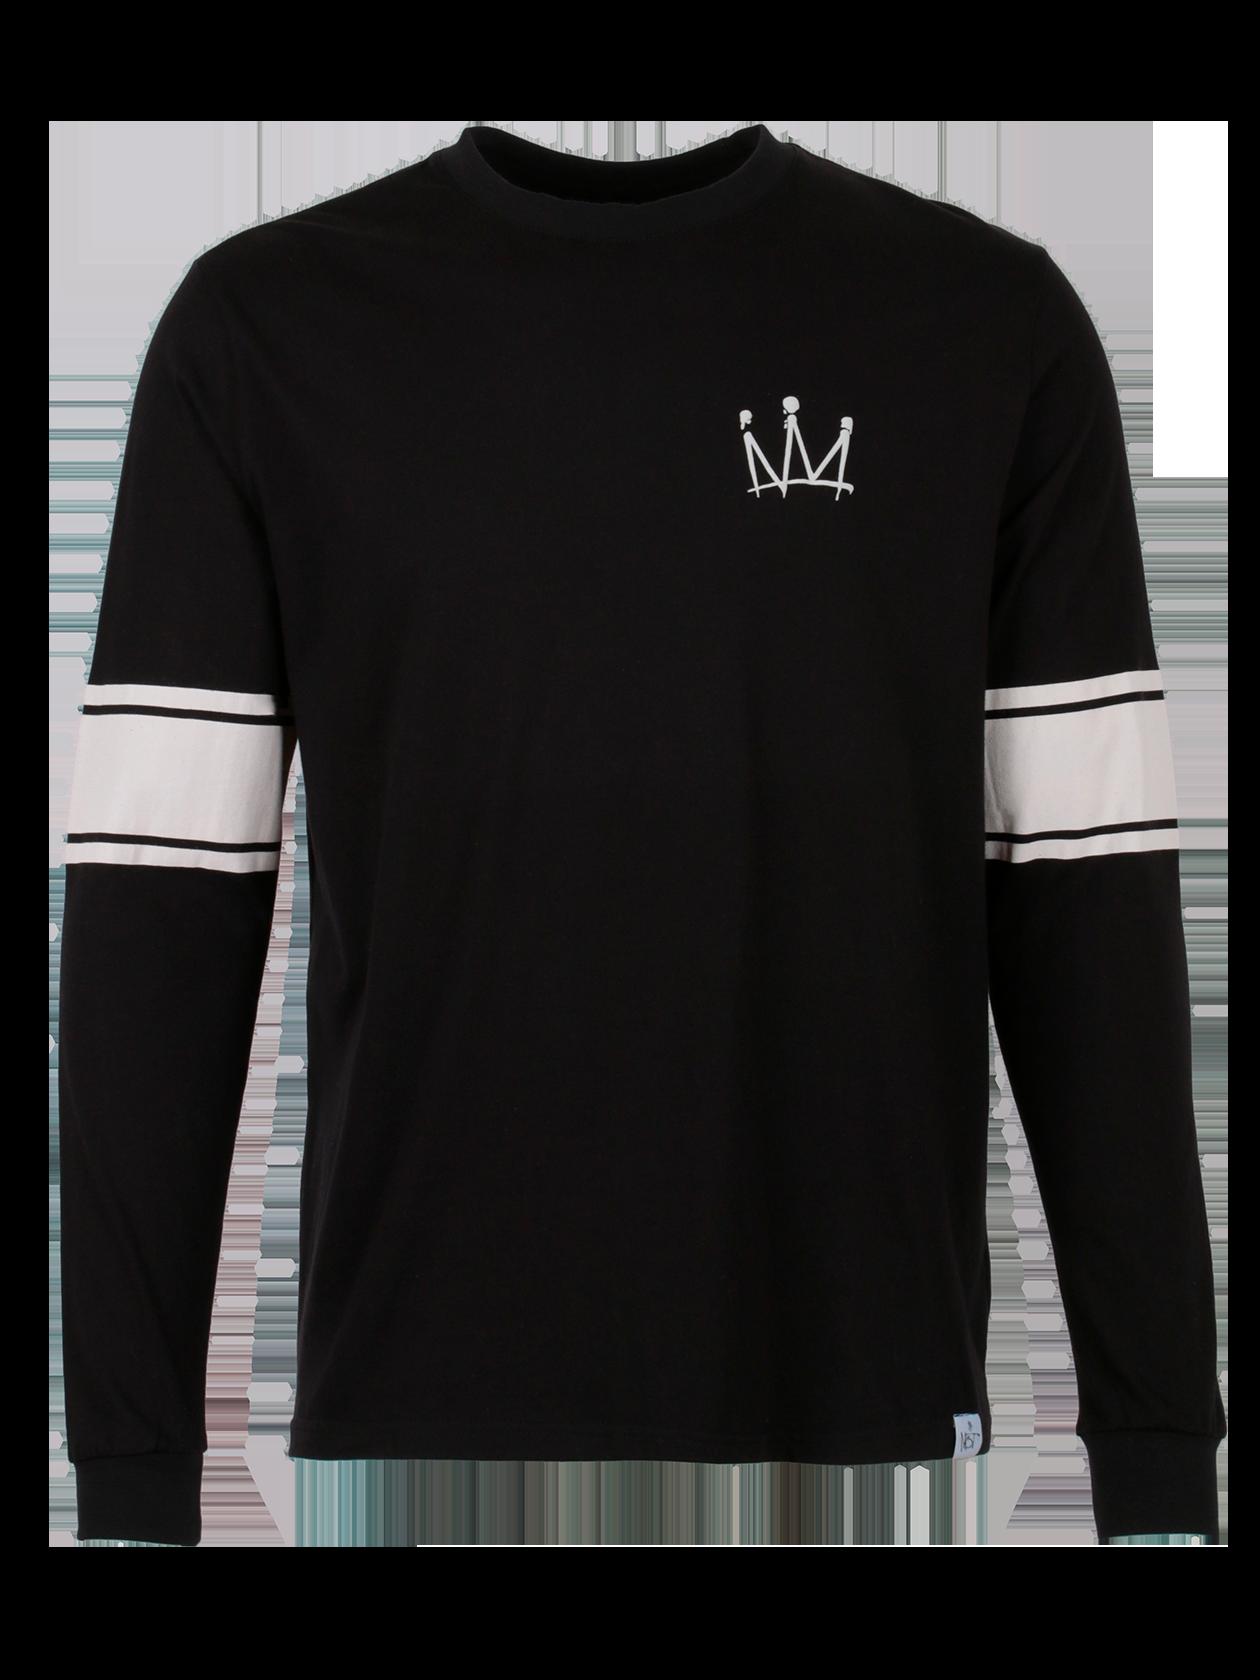 Лонгслив мужской MOT CROWN от Black Star Wear